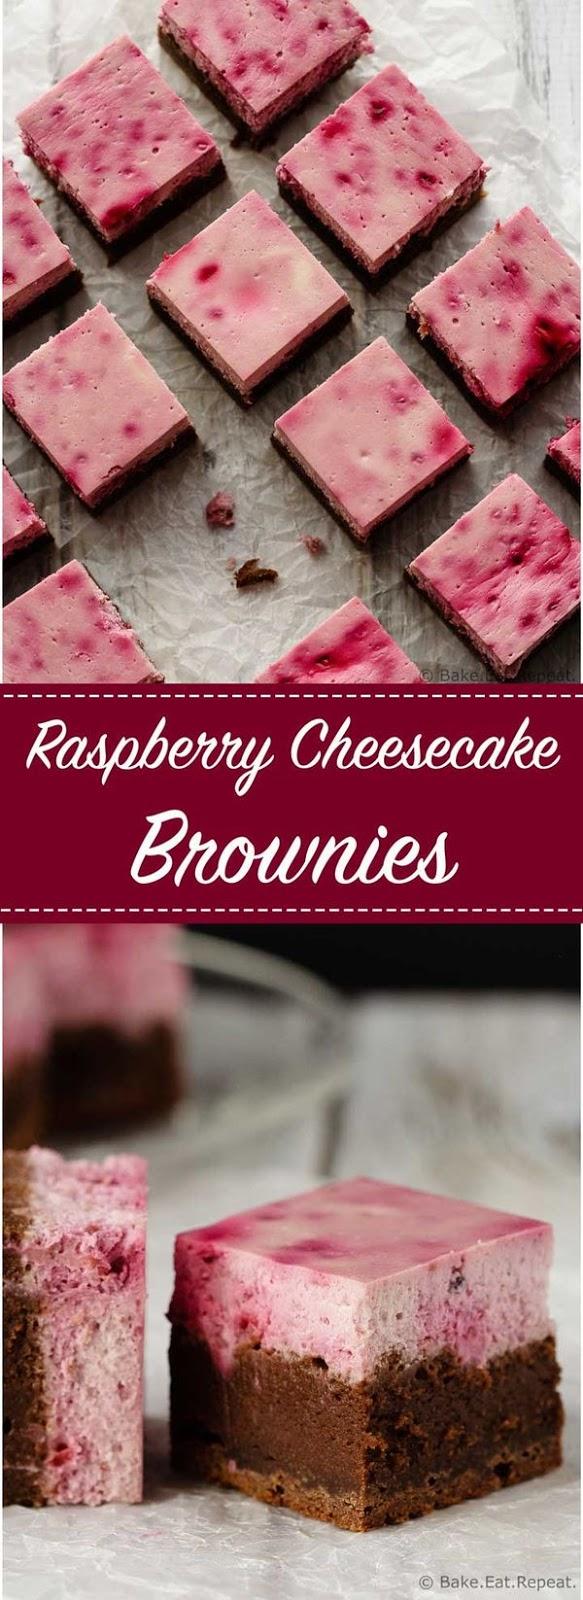 Raspberry Cheesecake Brownies Recipes